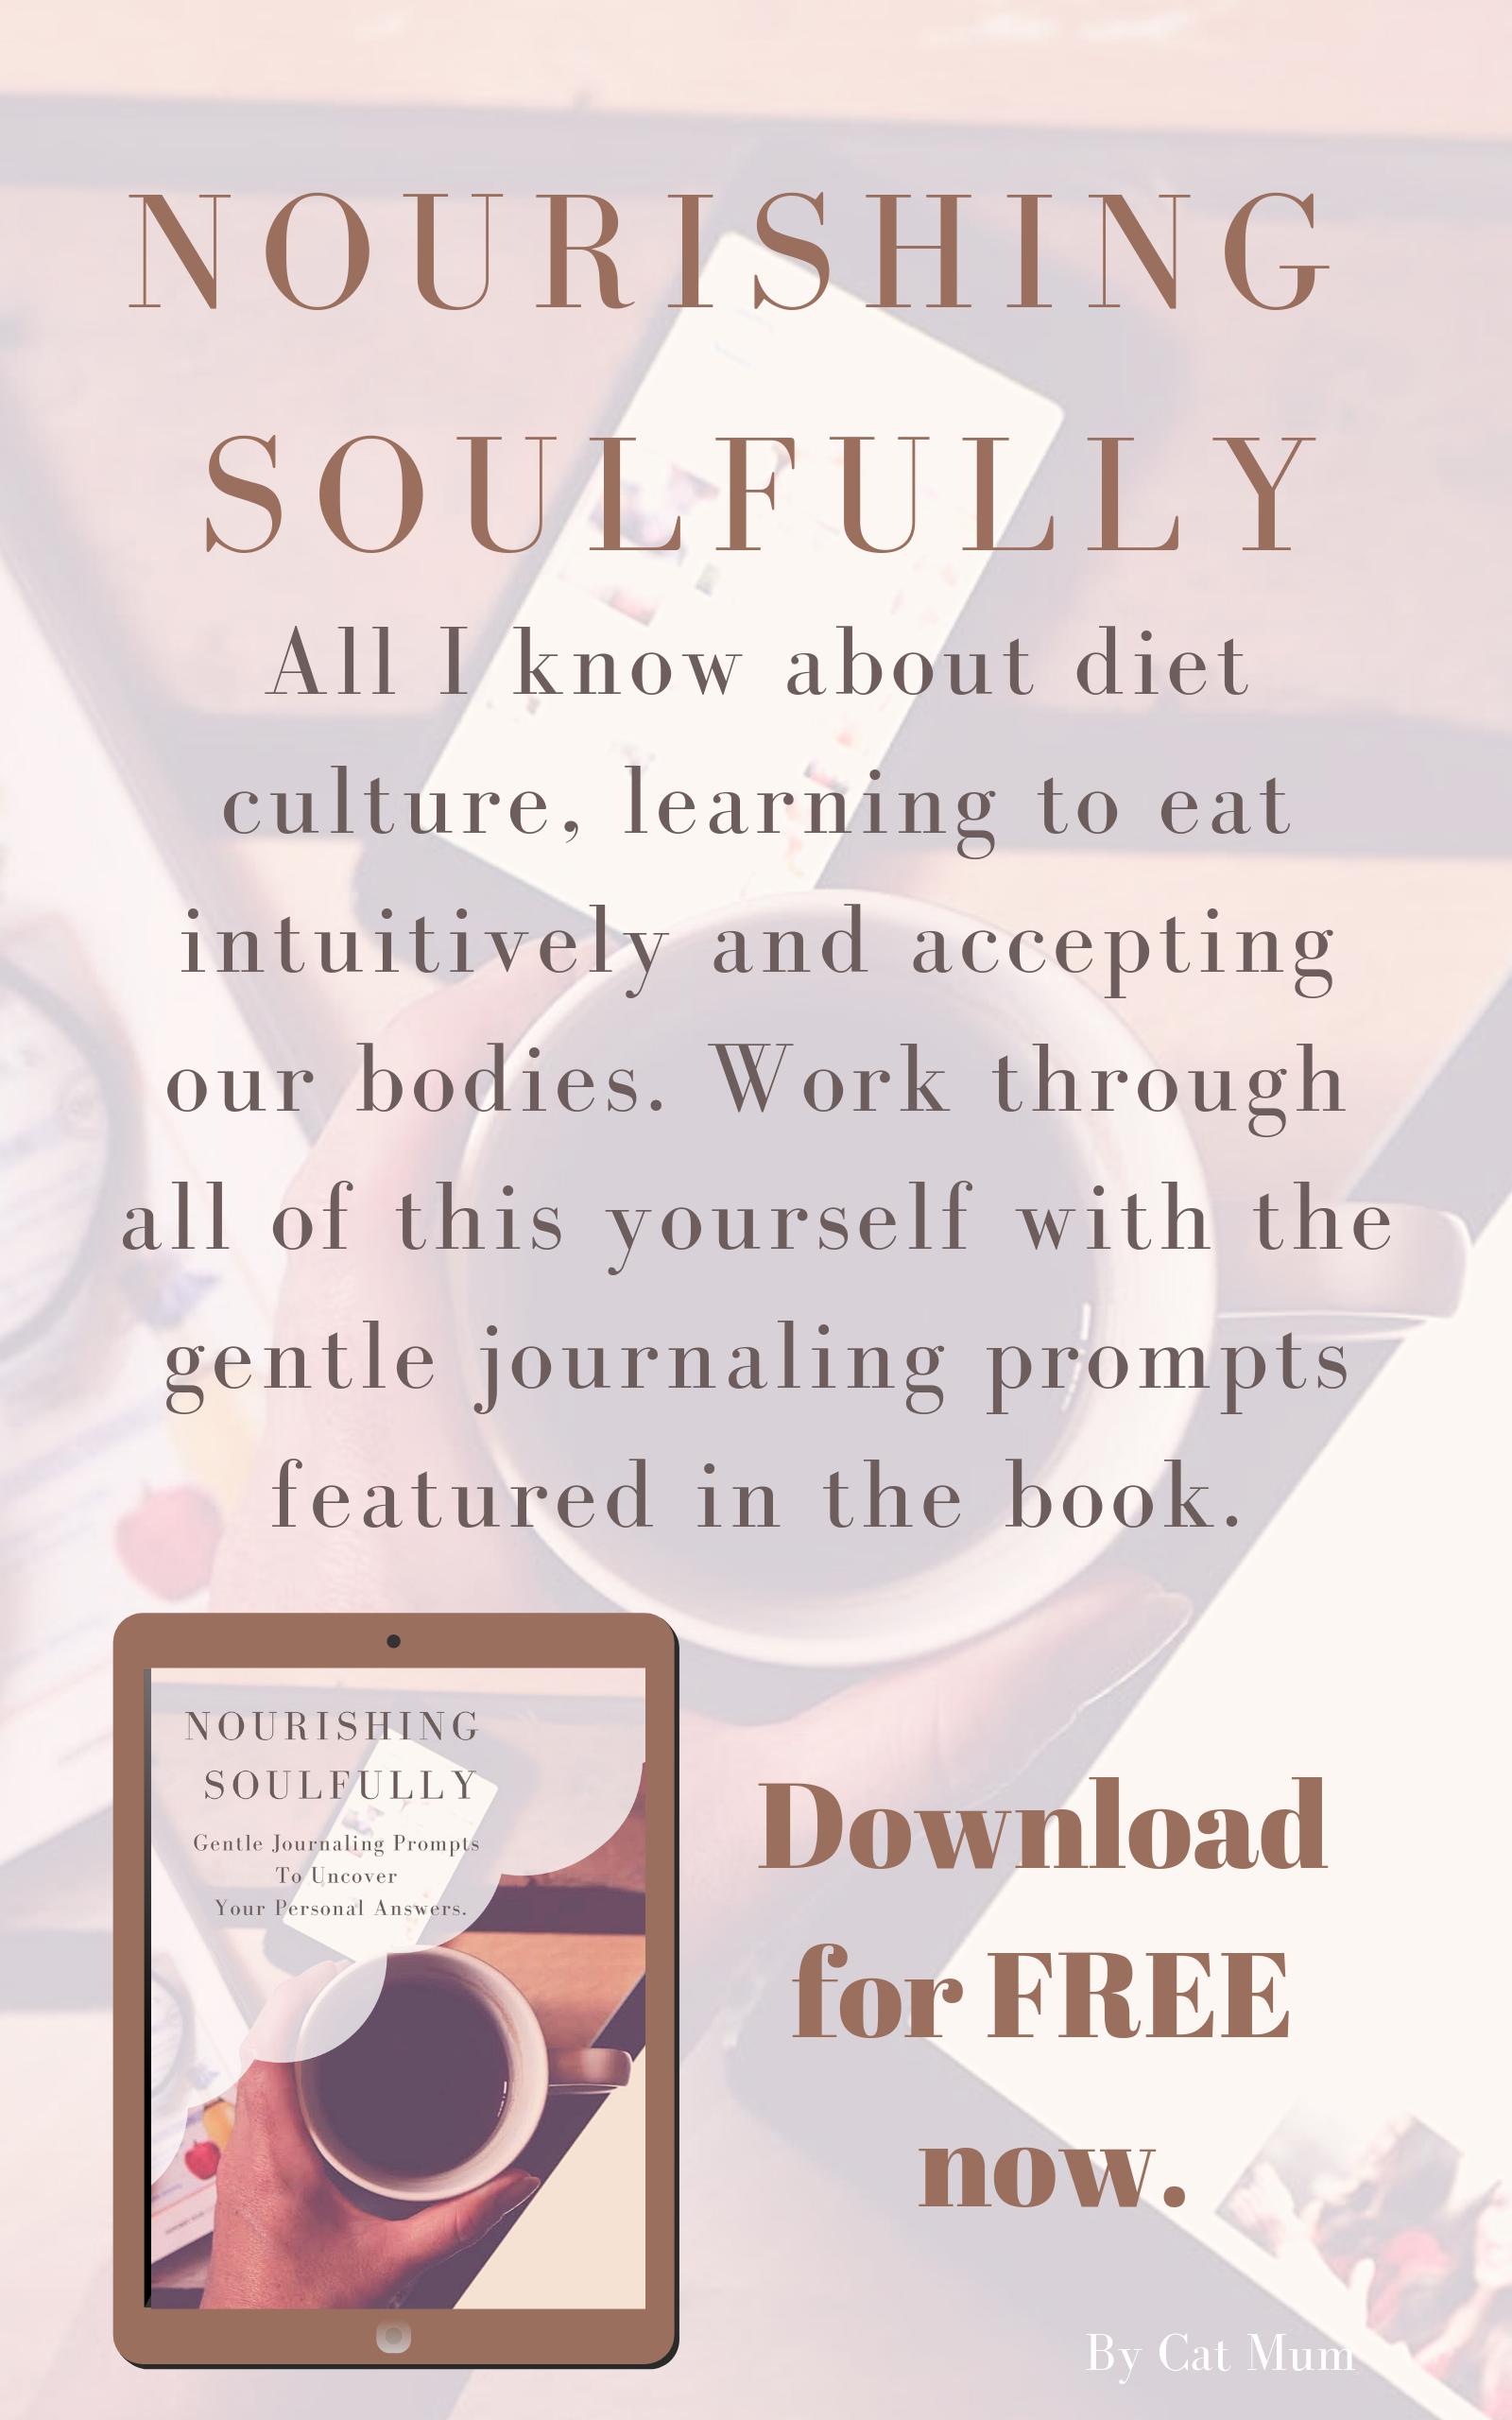 Nourishing Soulfully Ebook.png